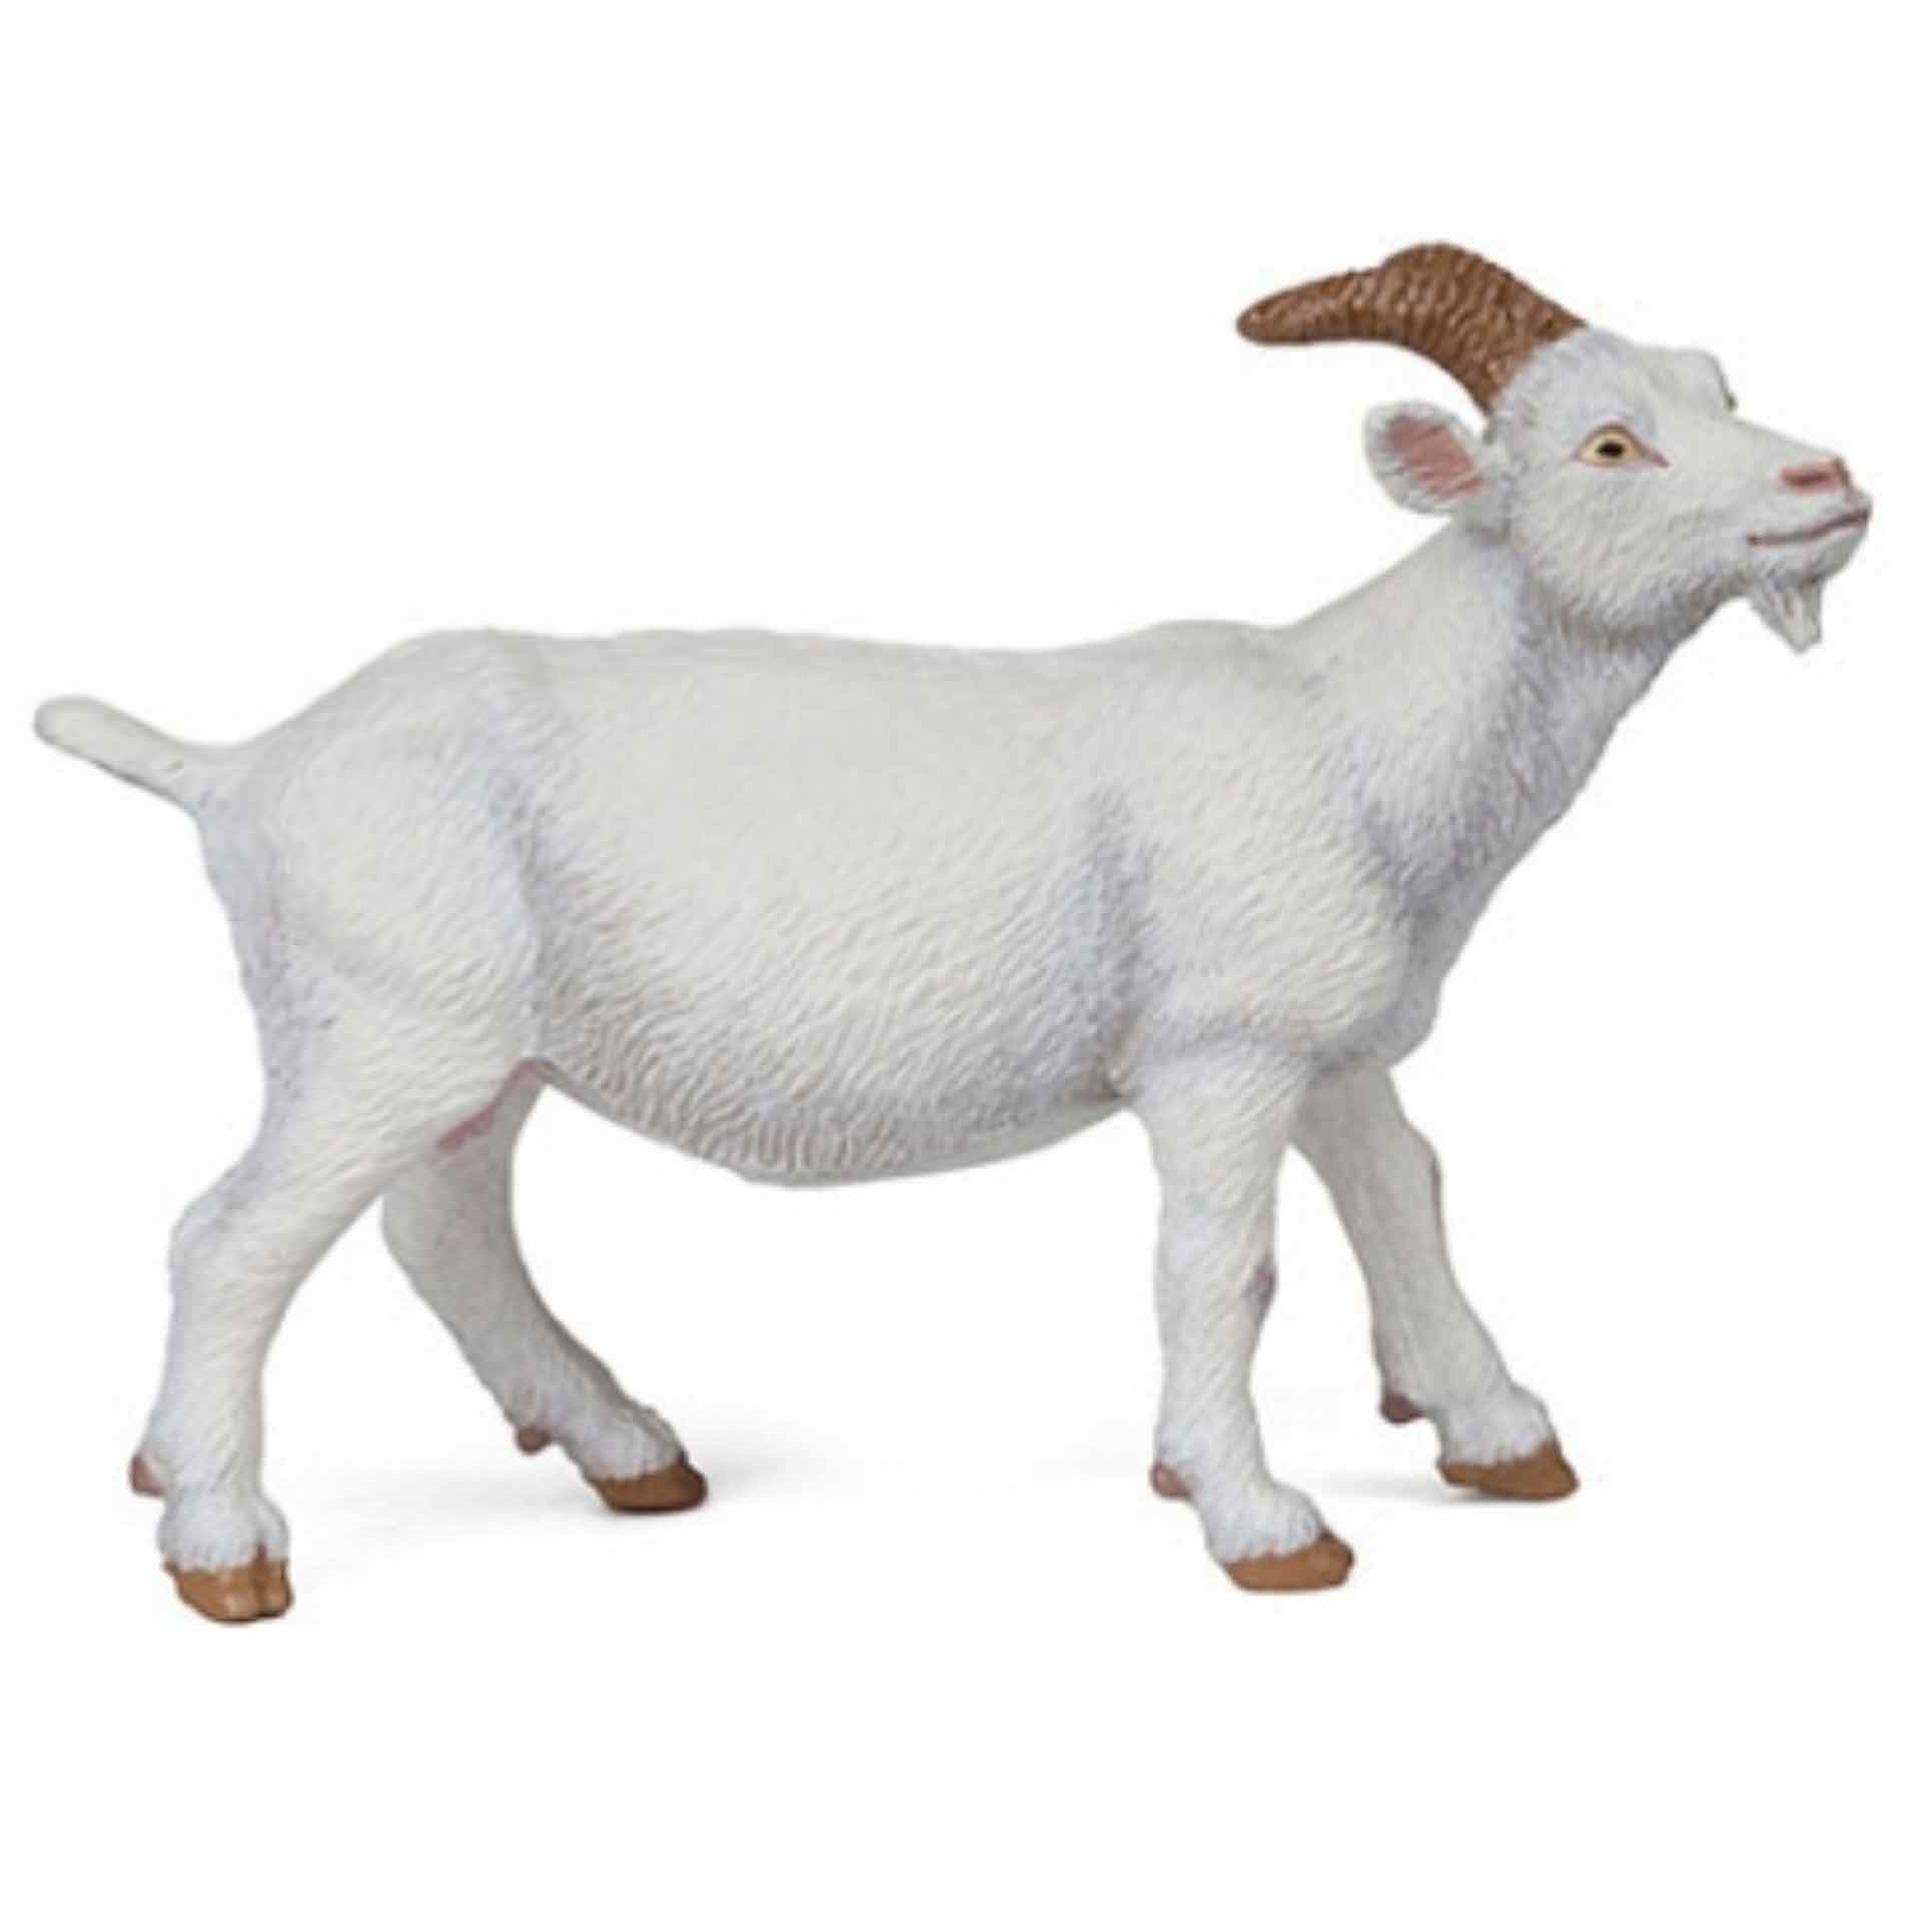 Plastic speelgoed figuur witte geit 9 cm